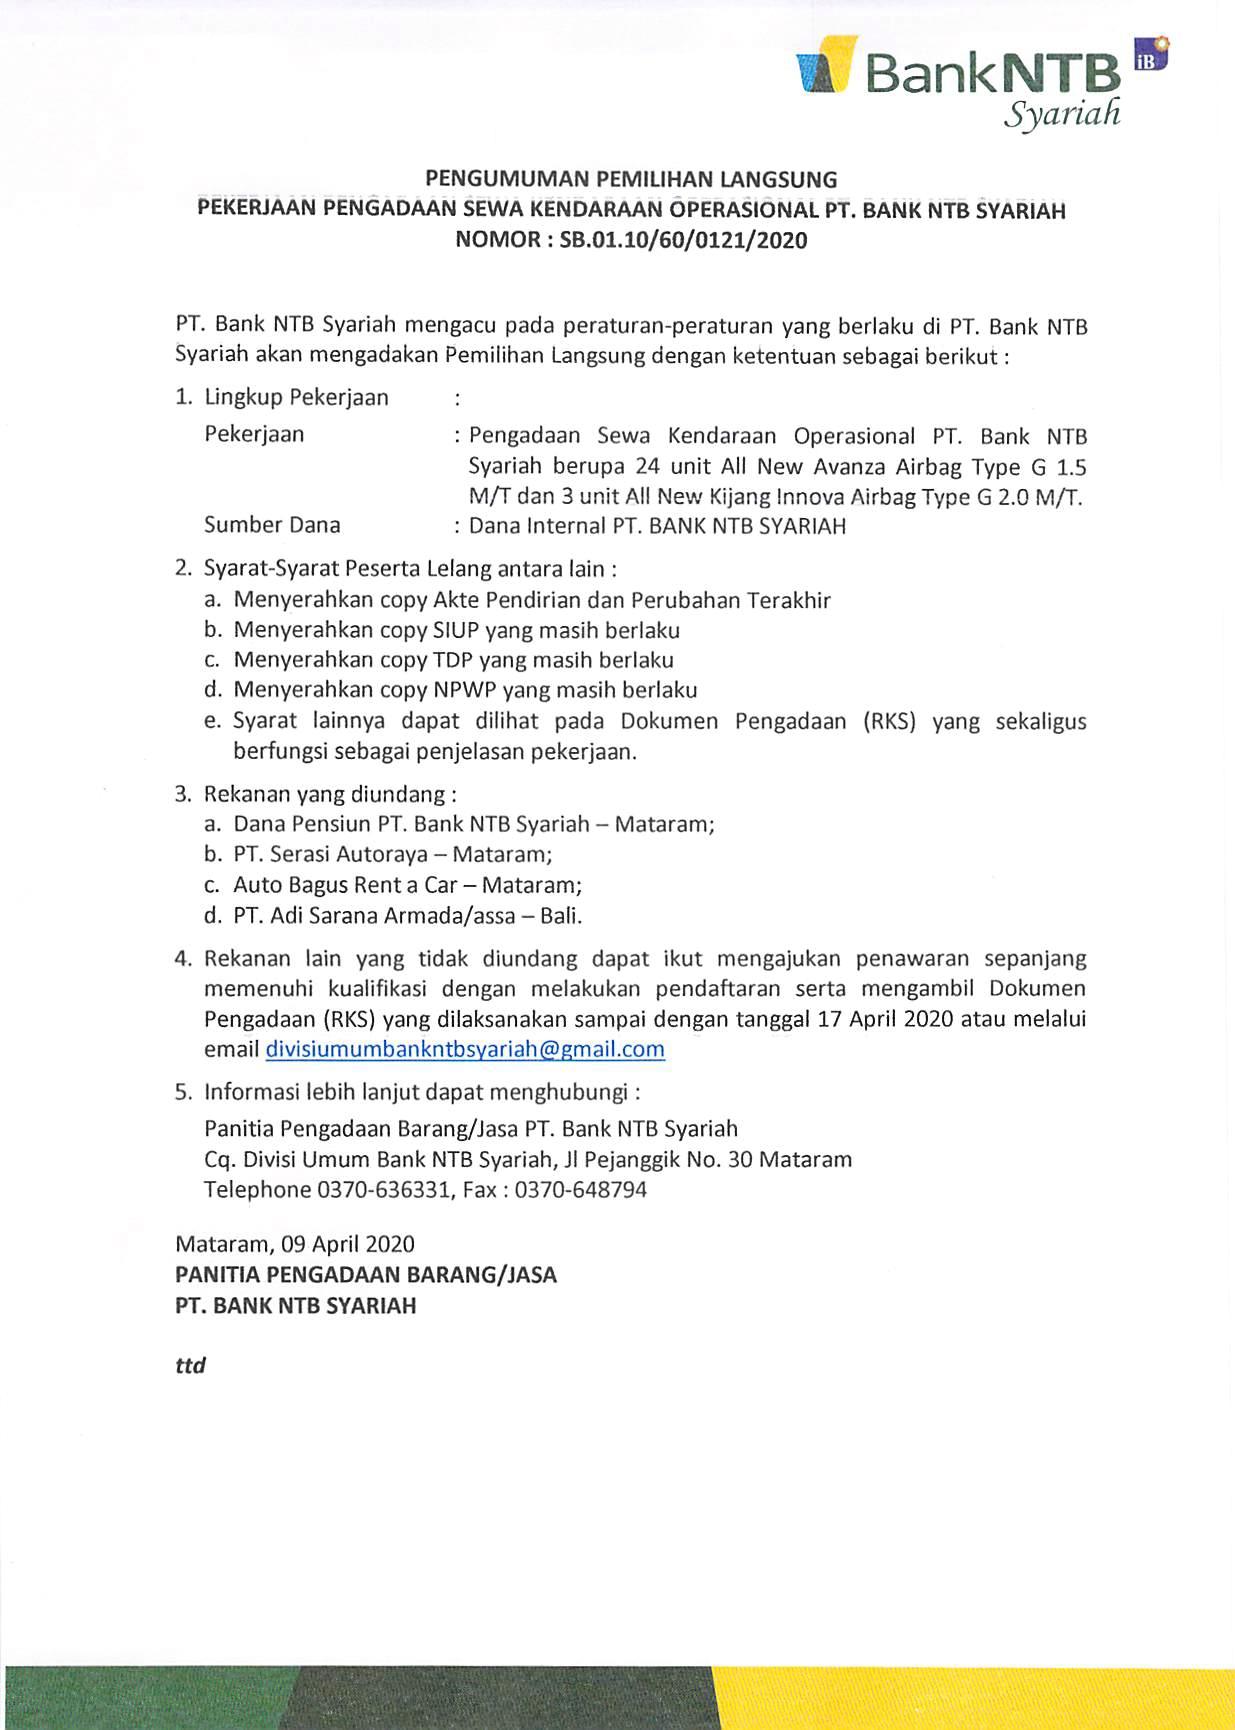 PENGUMUMAN-PEMILIHAN-LANGSUNG-PEKERJAAN-PENGADAAN-SEWA-KENDARAAN-OPERASIONAL-PT-BANK-NTB-SYARIAH-TH-2020.html